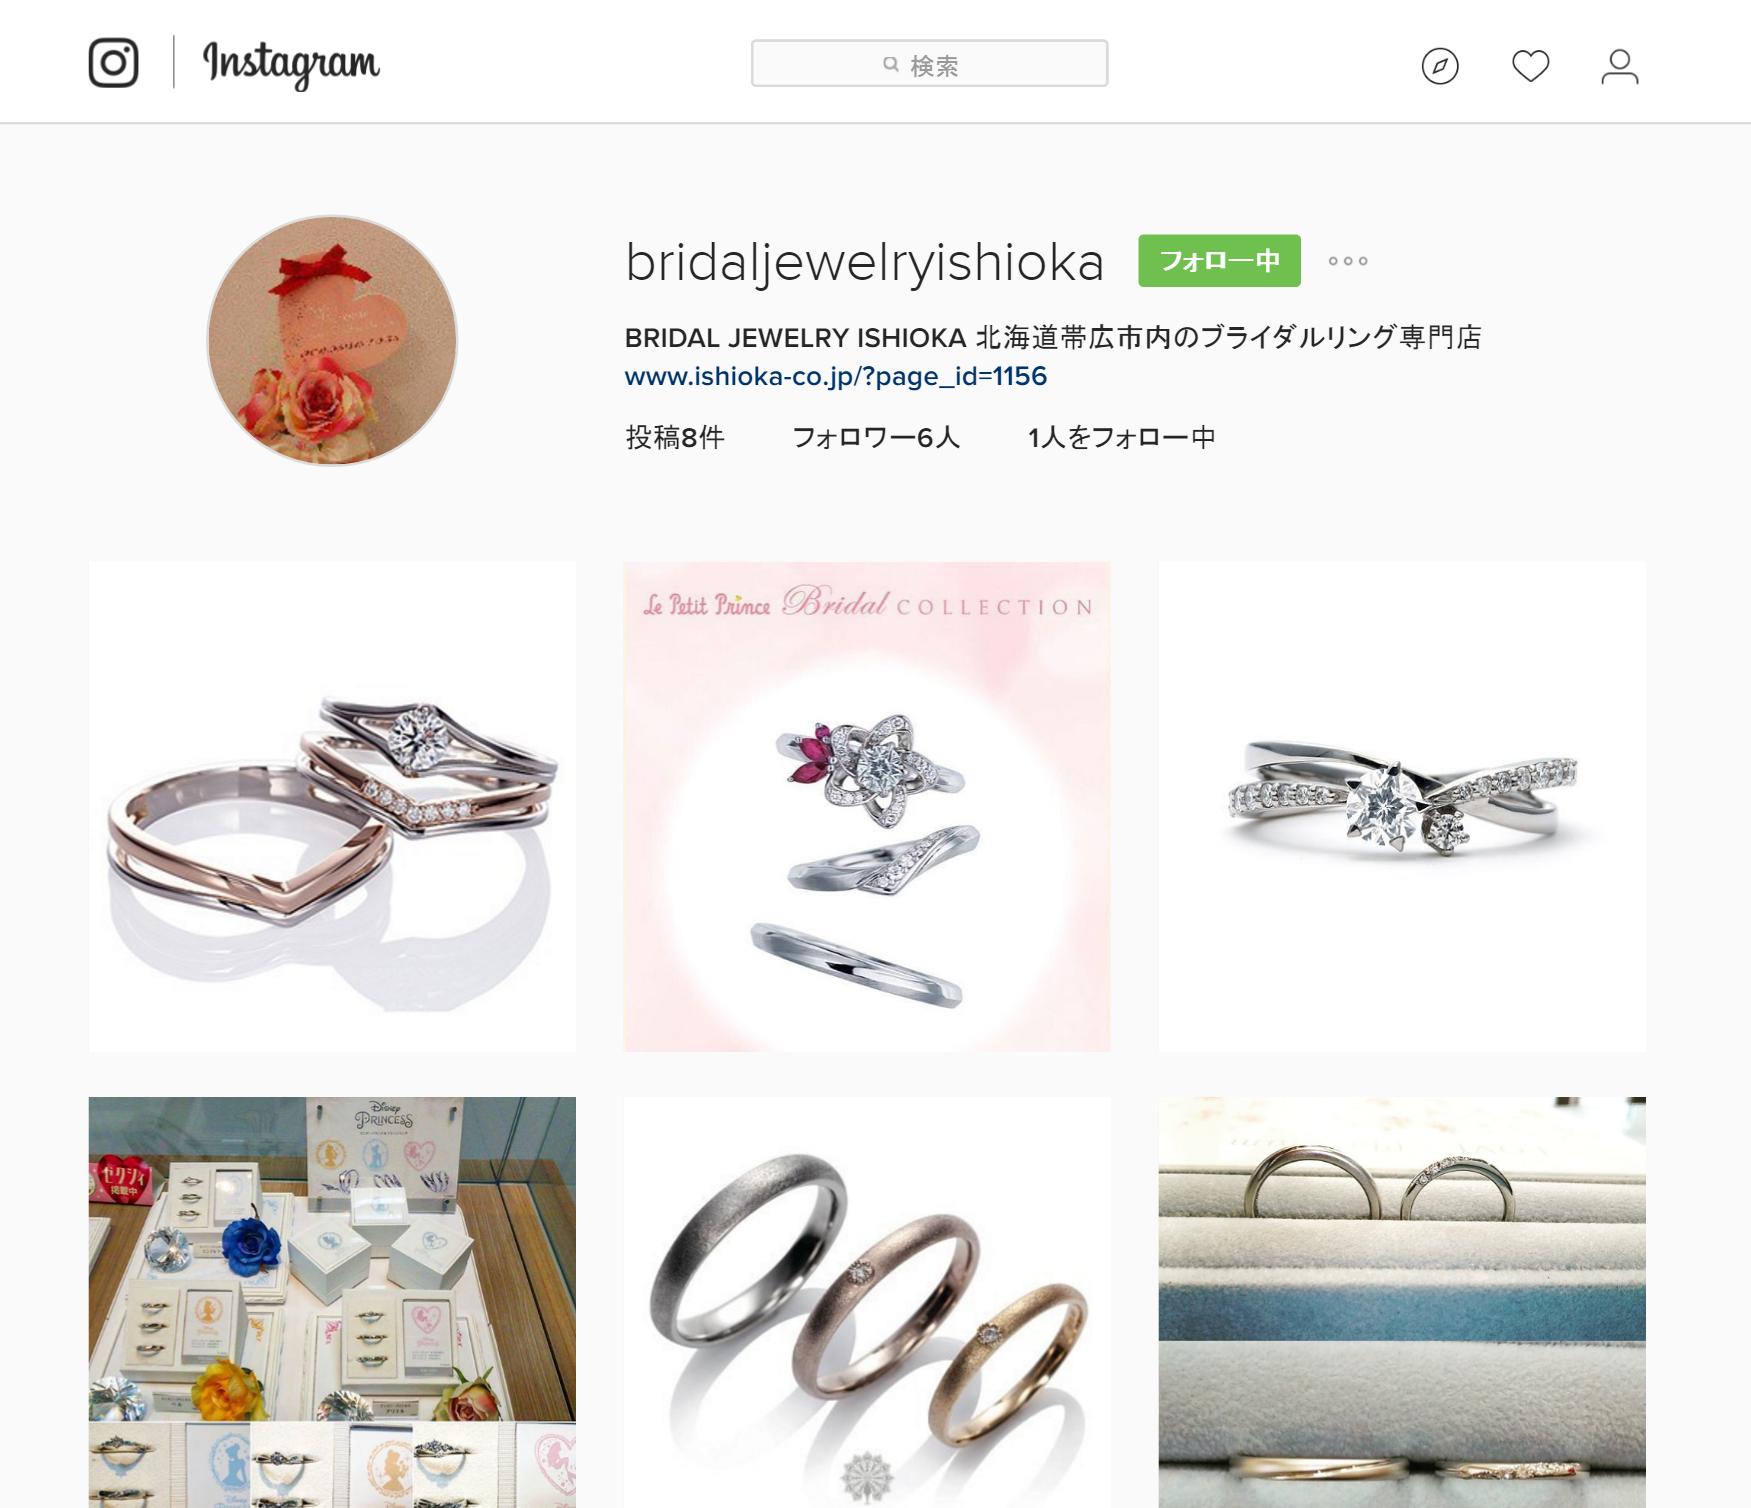 BRIDAL JEWELRY ISHIOKAさん @bridaljewelryishioka  • Instagram写真と動画